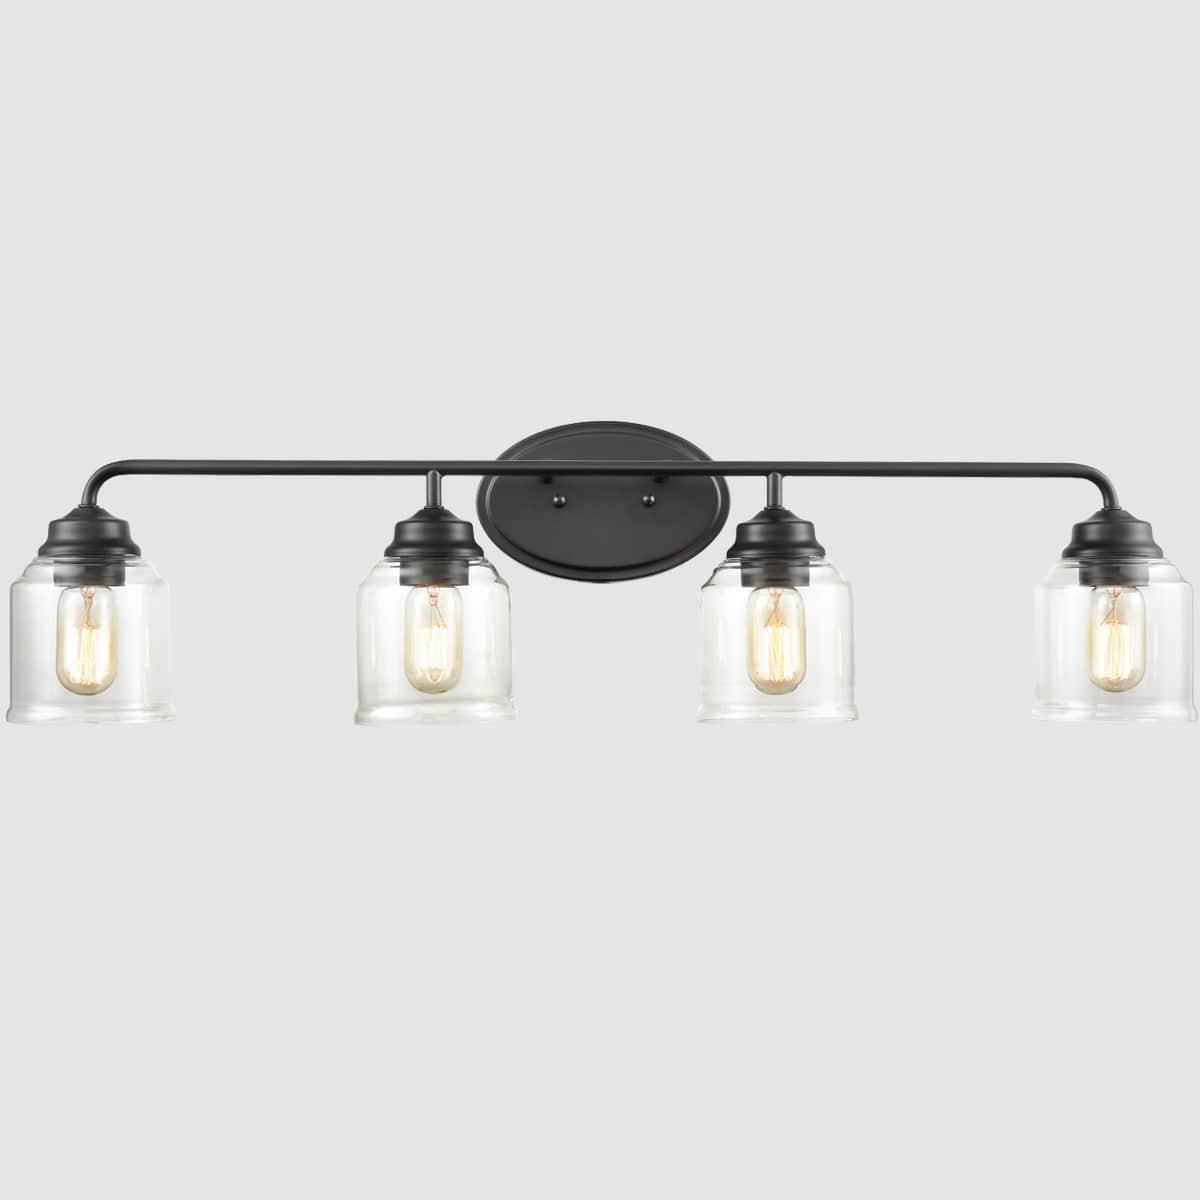 Black Bathroom Wall Sconce 4 Lights, Modern Bathroom Light Fixtures Black